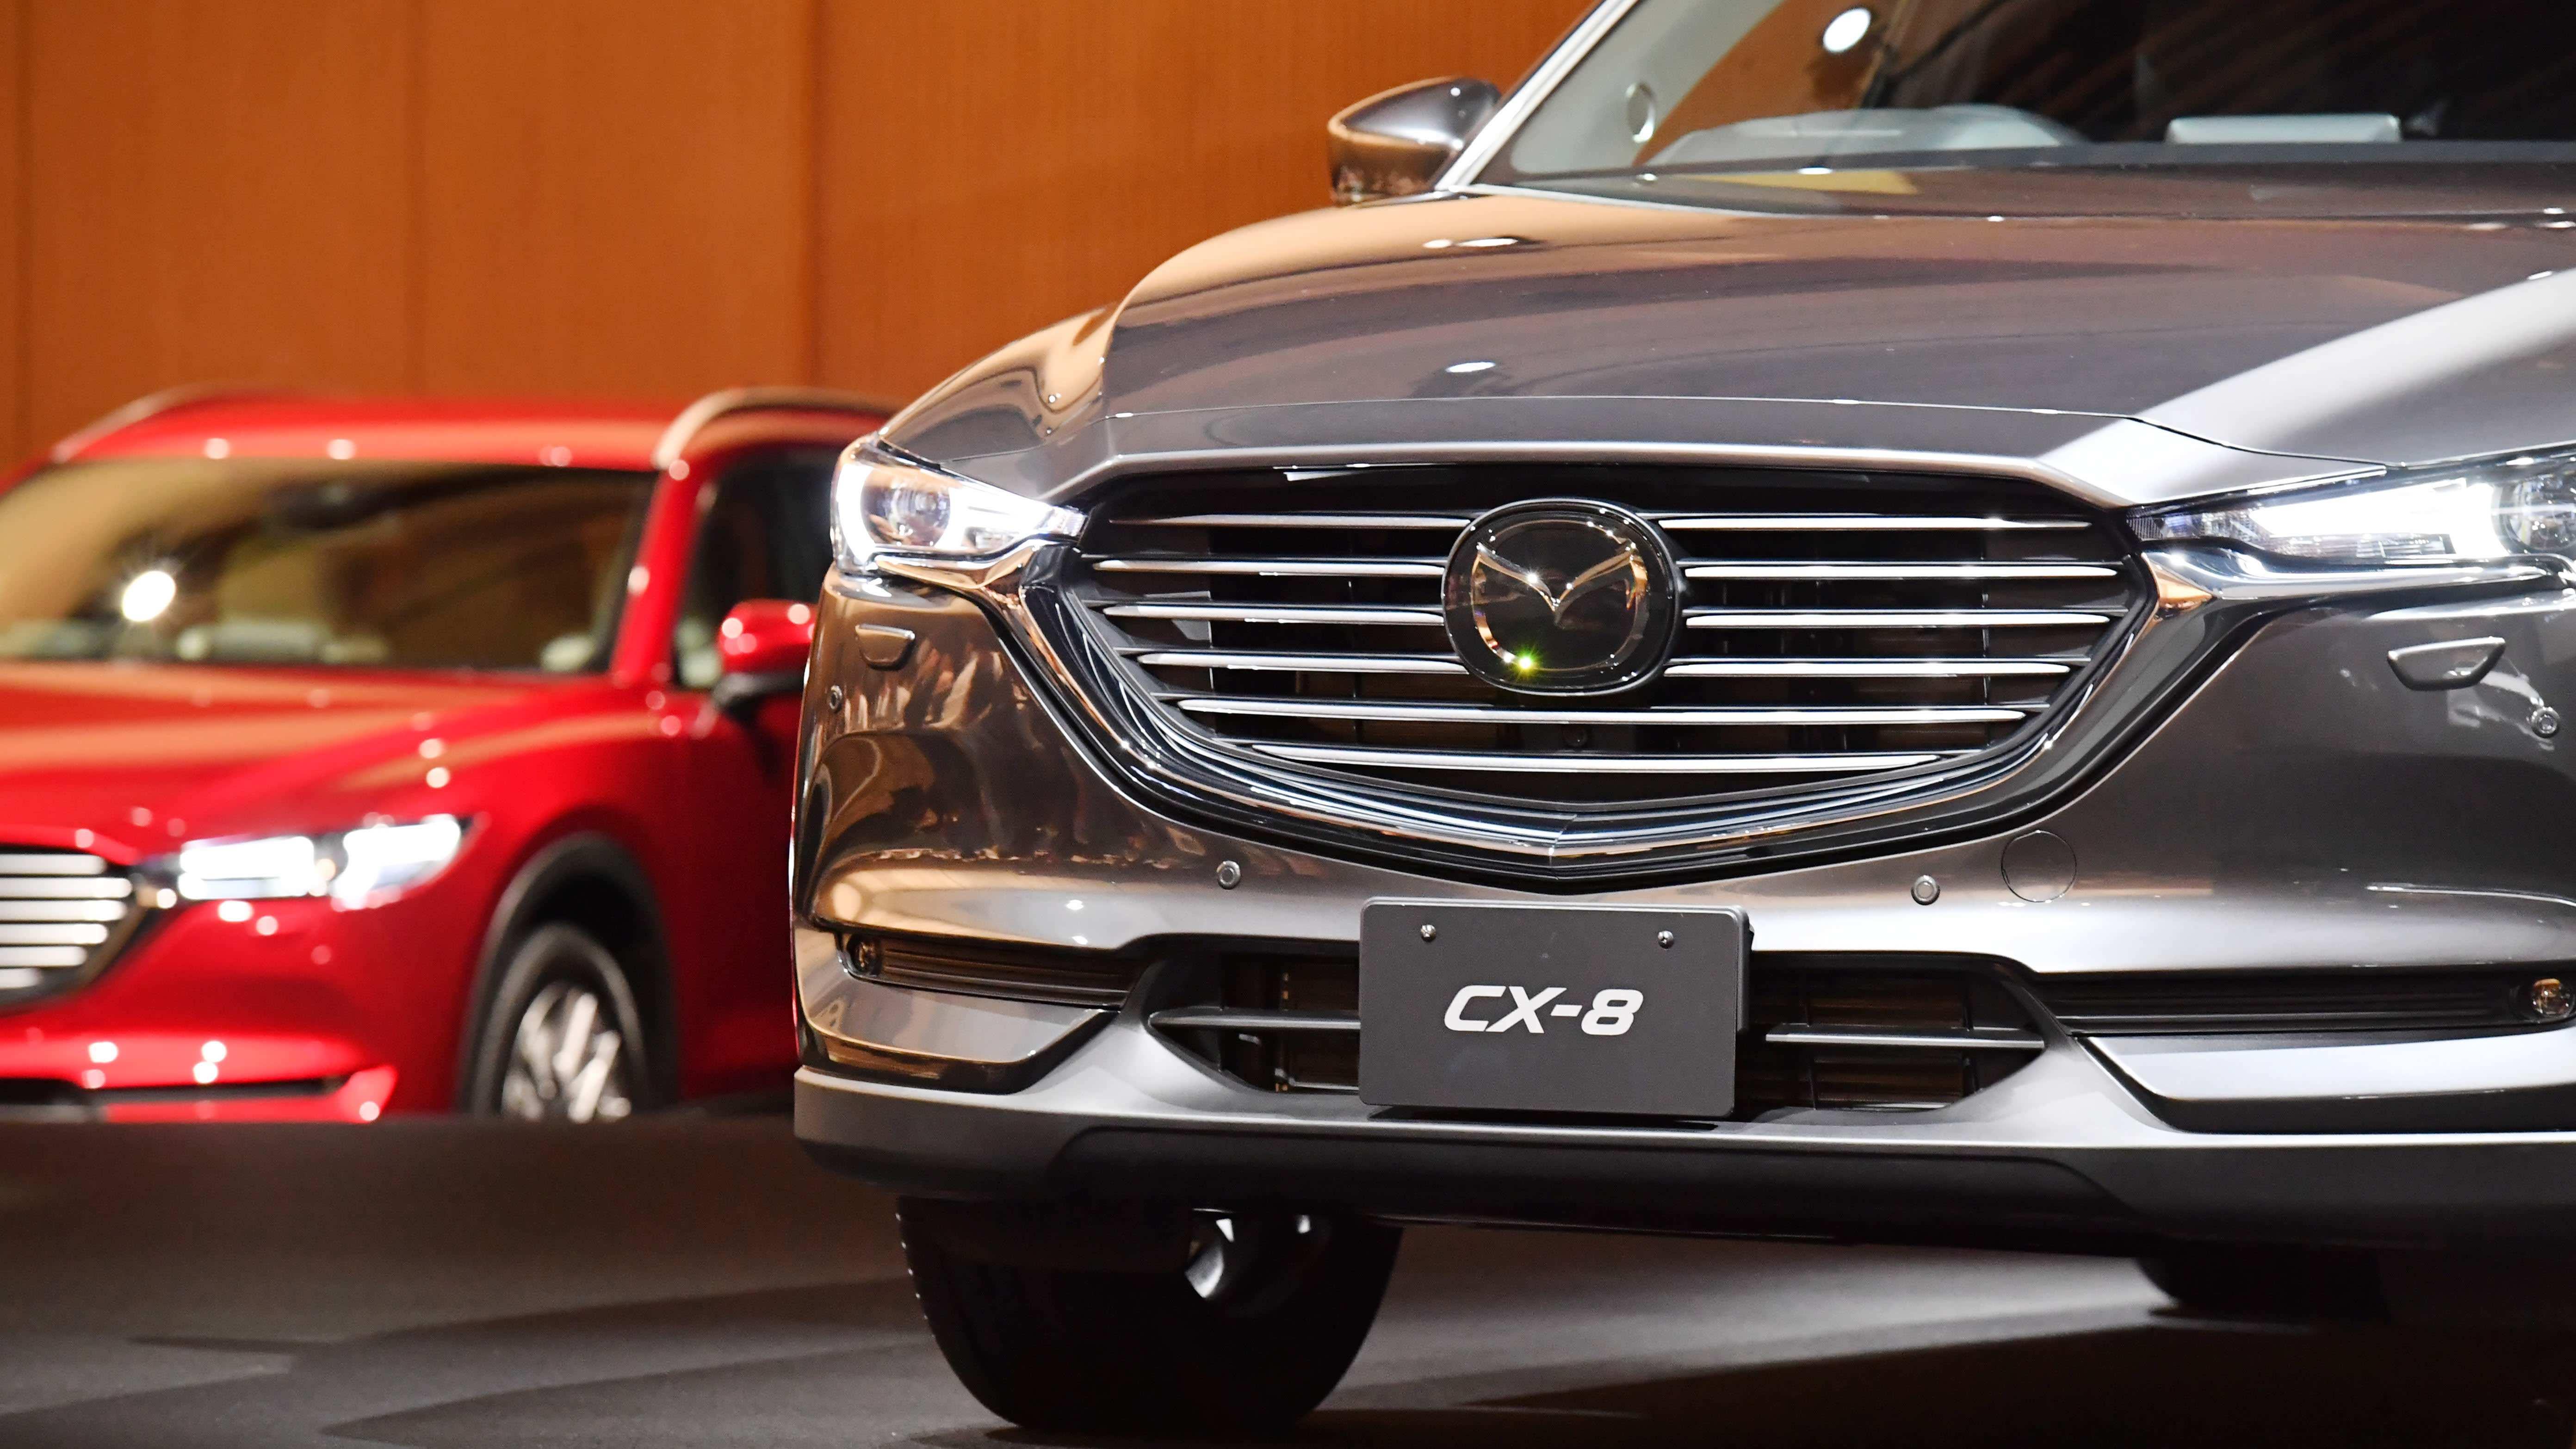 77 All New 2020 Mazda Cx 5 Reviews by 2020 Mazda Cx 5